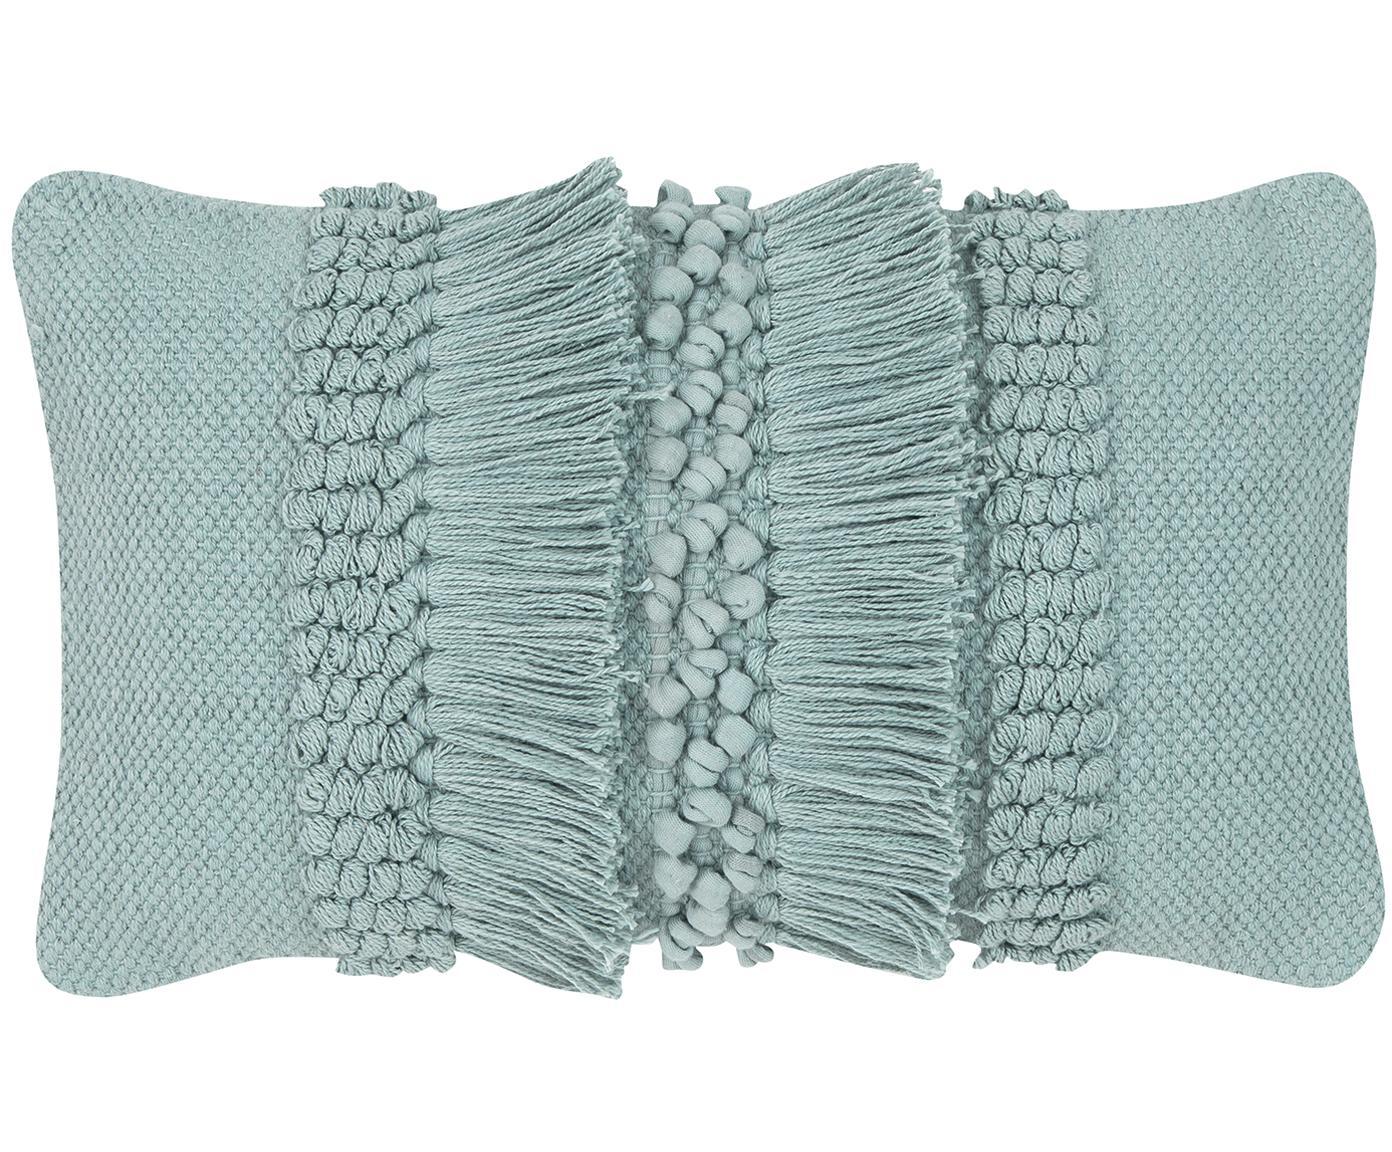 Kissenhülle Monika, 100% Baumwolle, Salbeigrün, 30 x 50 cm